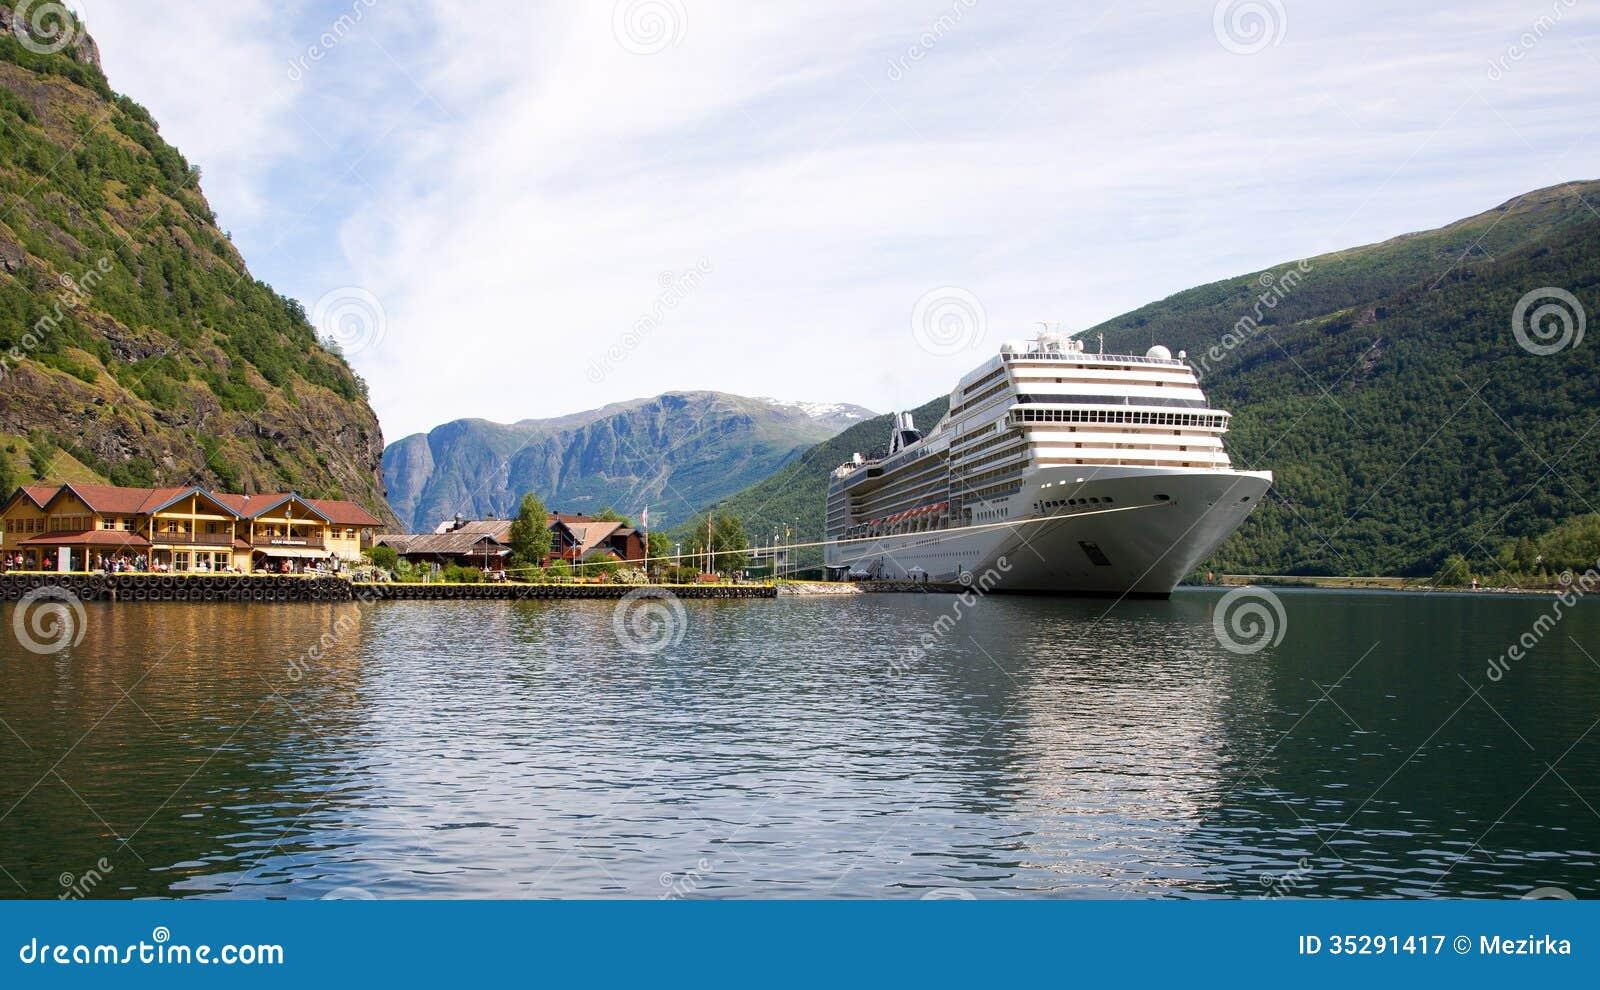 Port Of Flam Norway Stock Image Image Of European